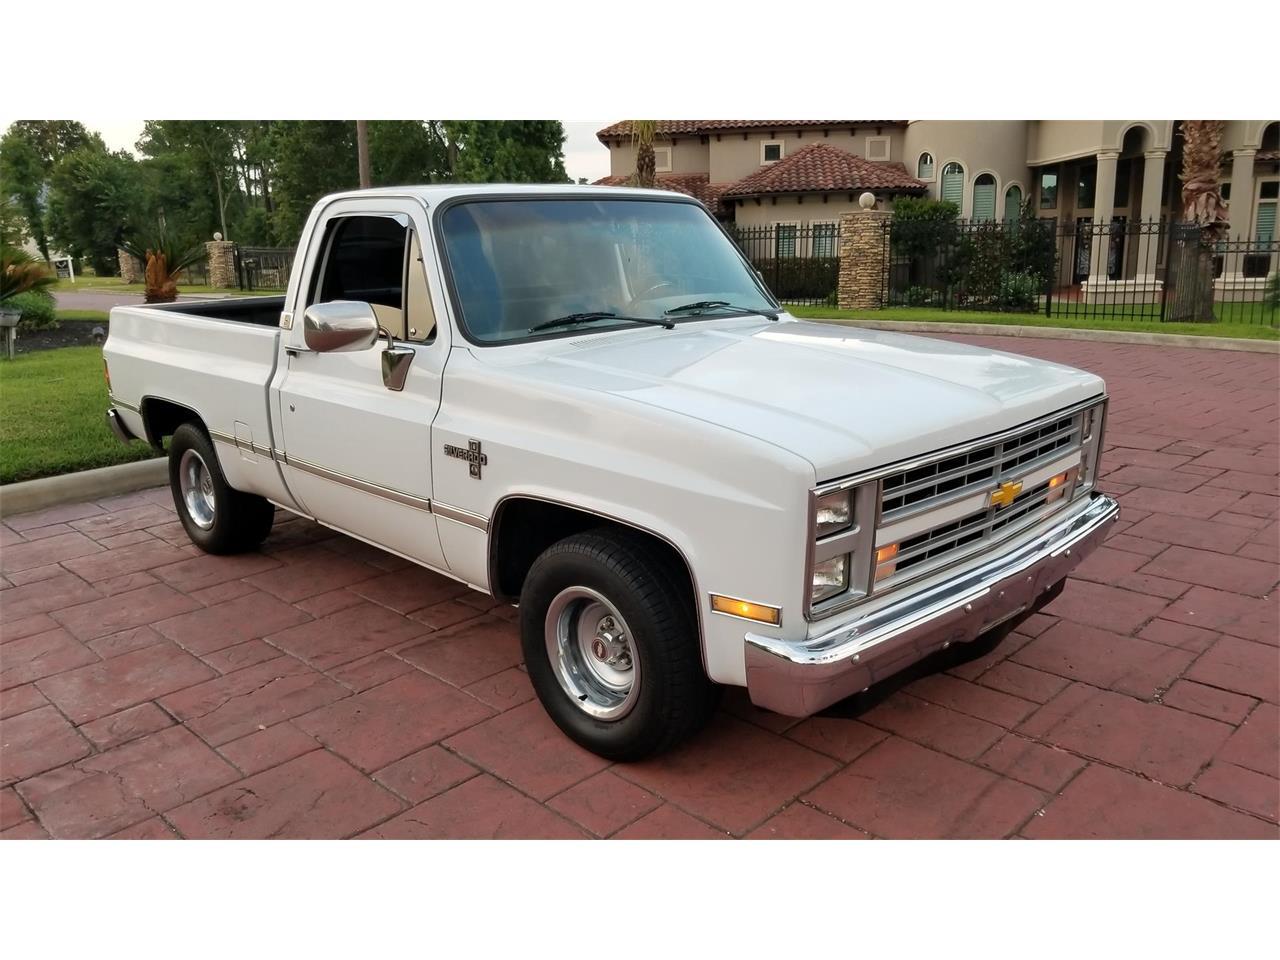 1987 Chevrolet C10 For Sale Classiccars Com Cc 1099081